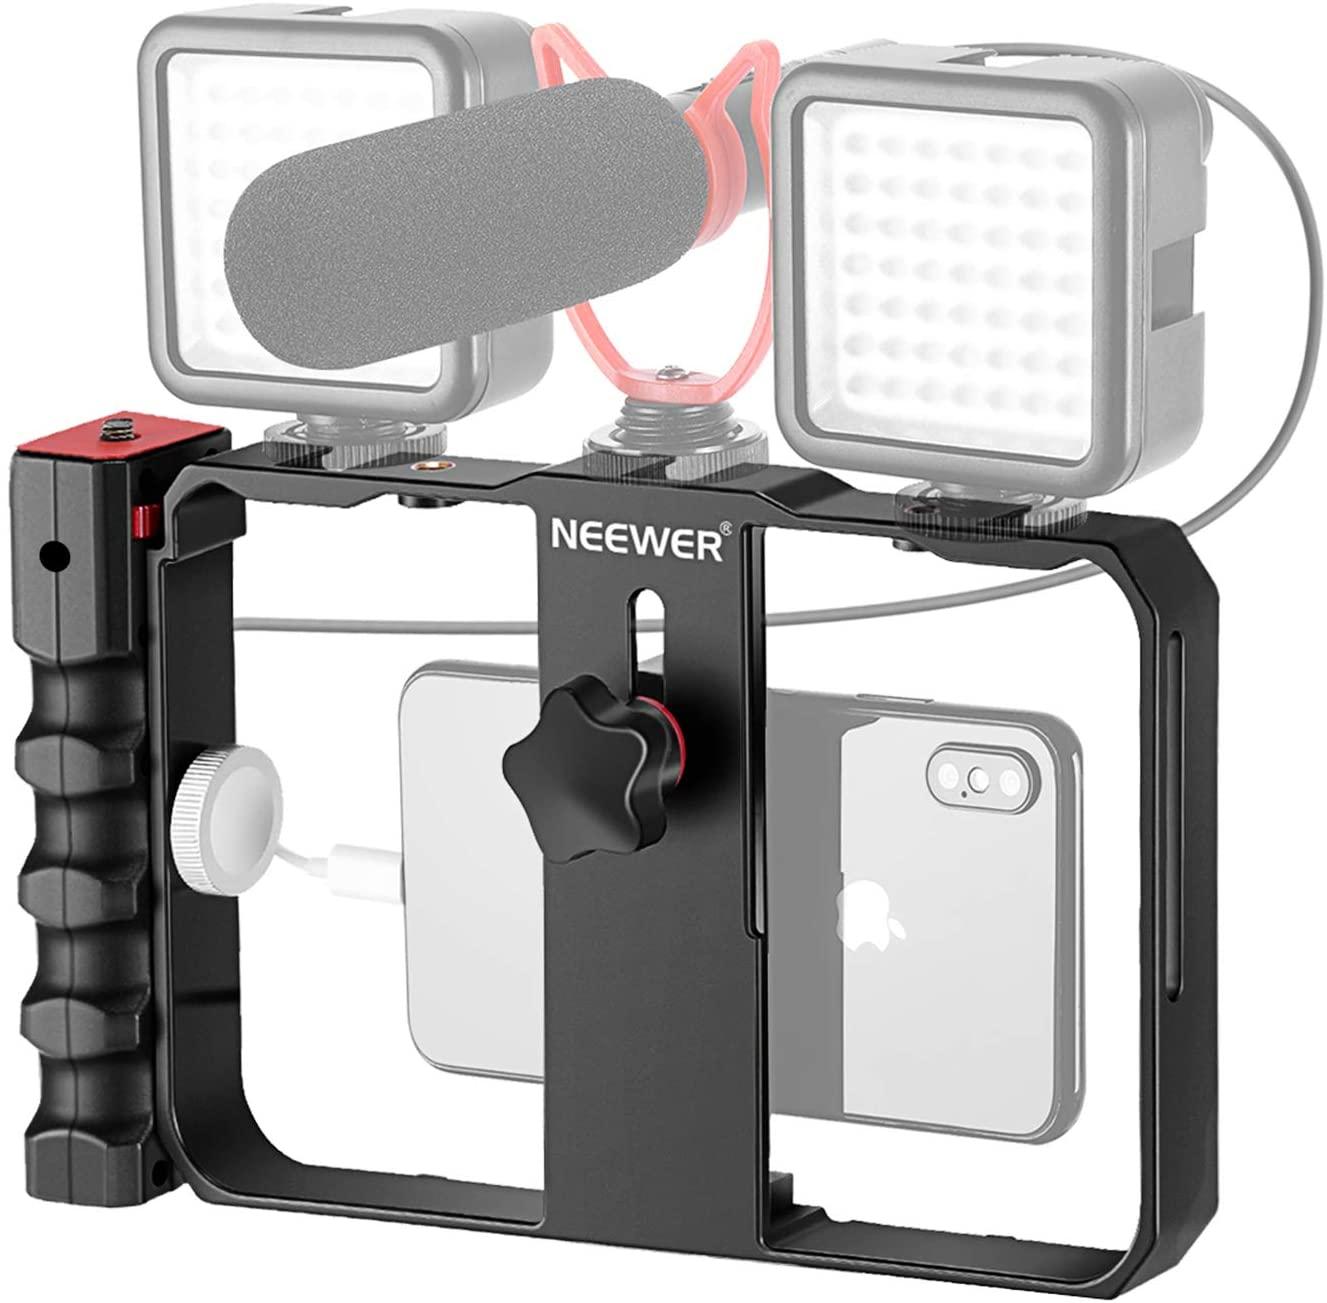 Neewer U Rig Video Stabilizer for Smartphone - $11.87 AC + FSSS